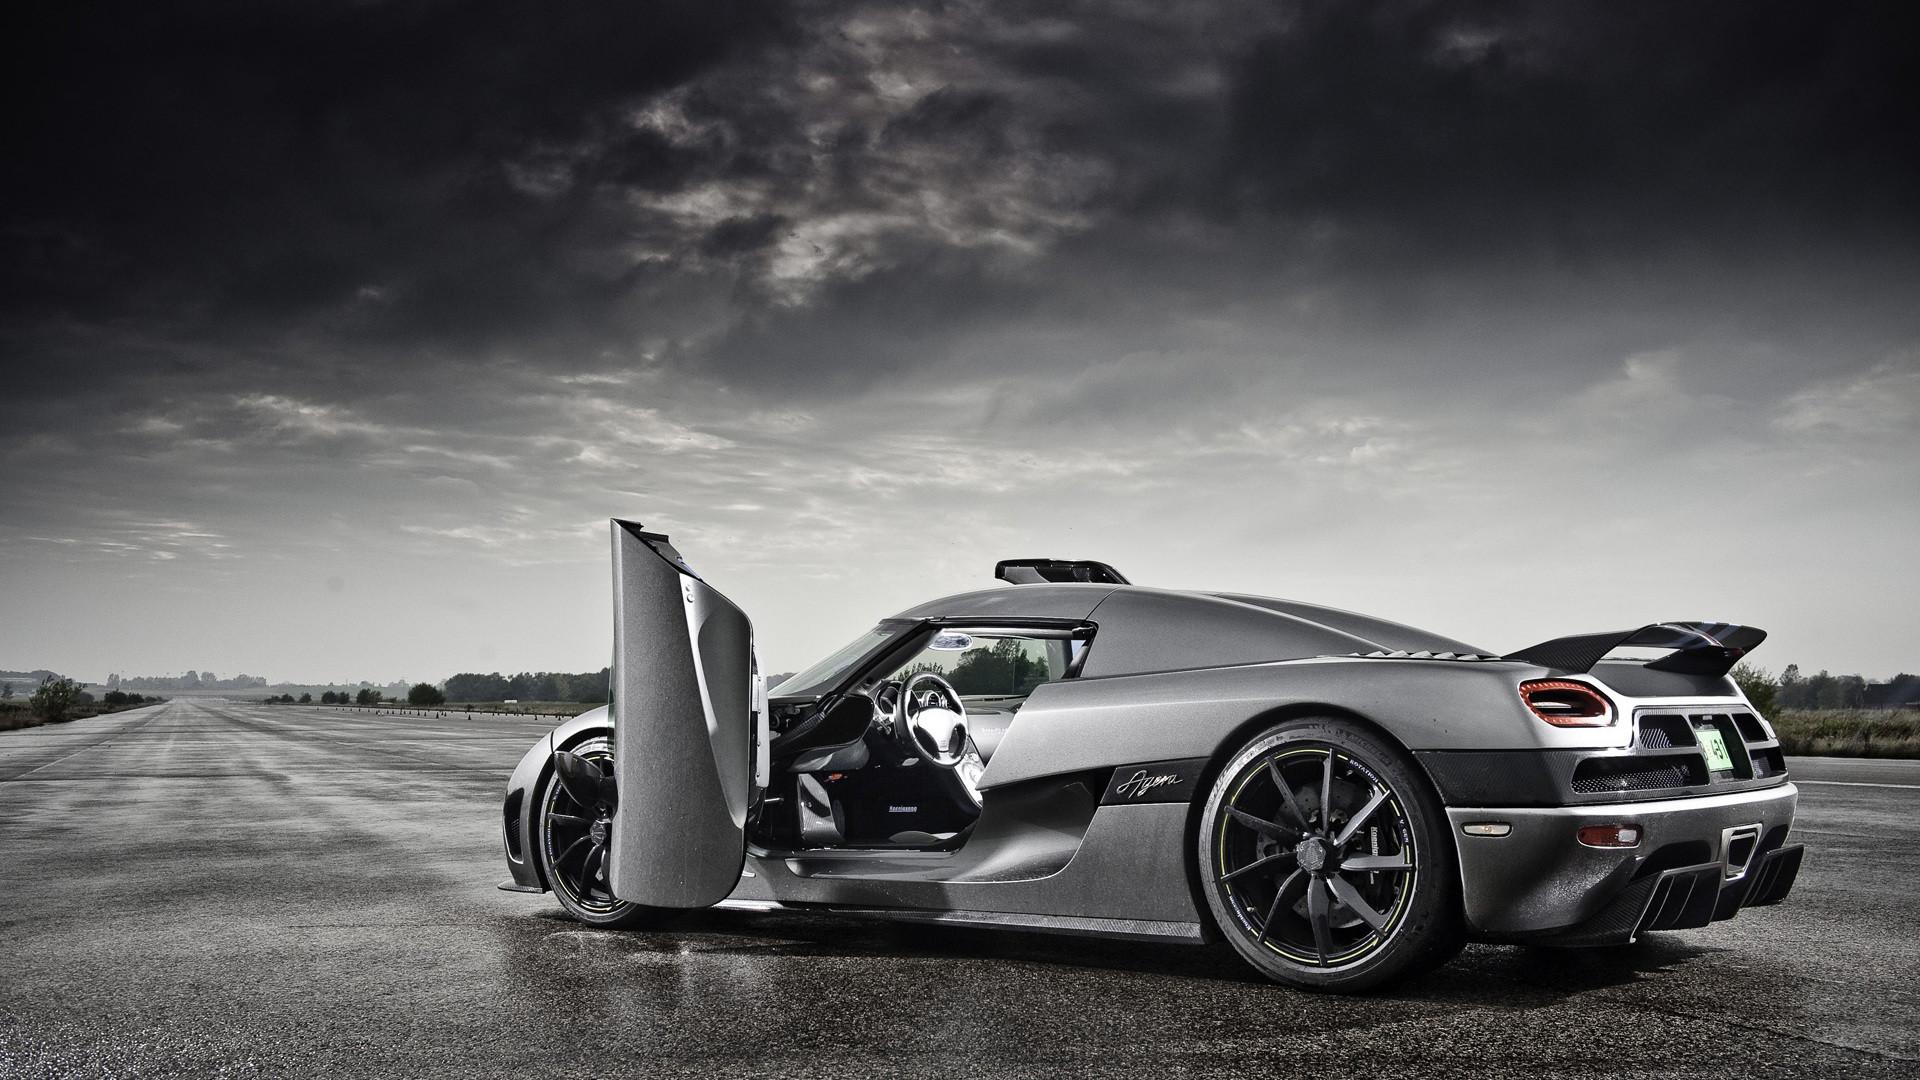 Koenigsegg Ccxr Wallpaper HD